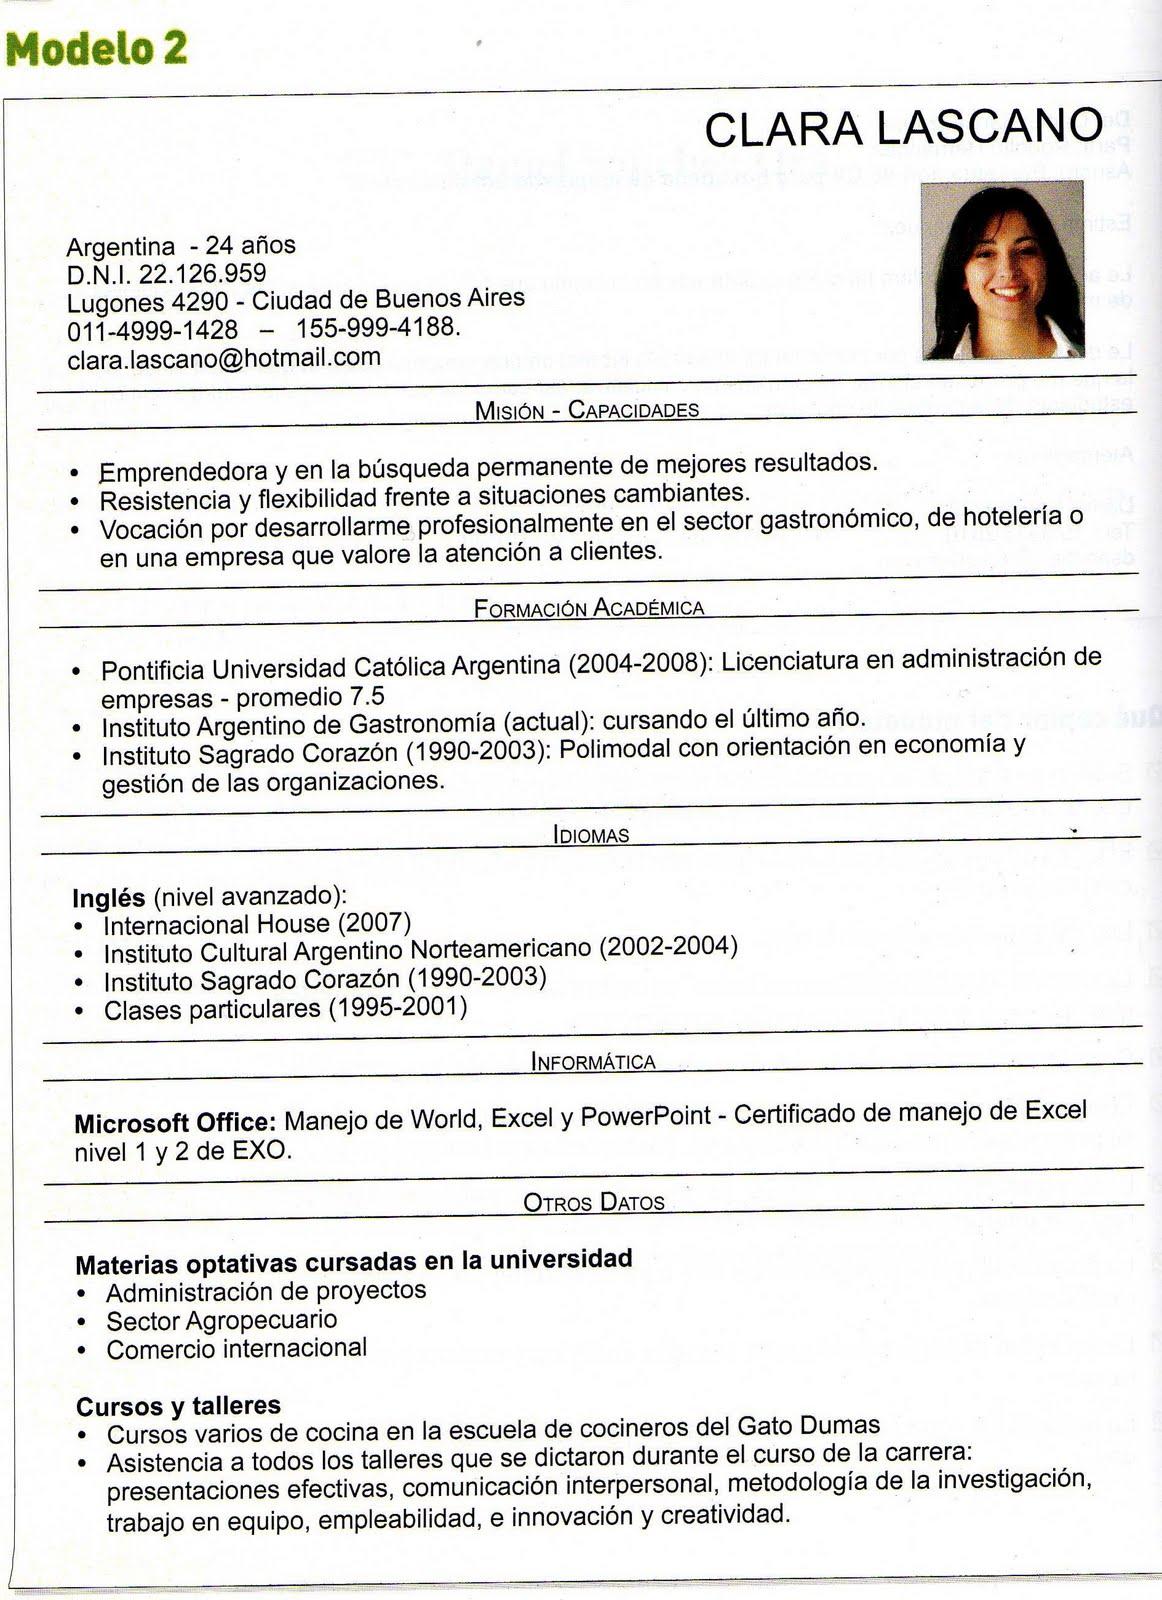 Excepcional Muestra De Curriculum Vitae Norteamericano Friso ...